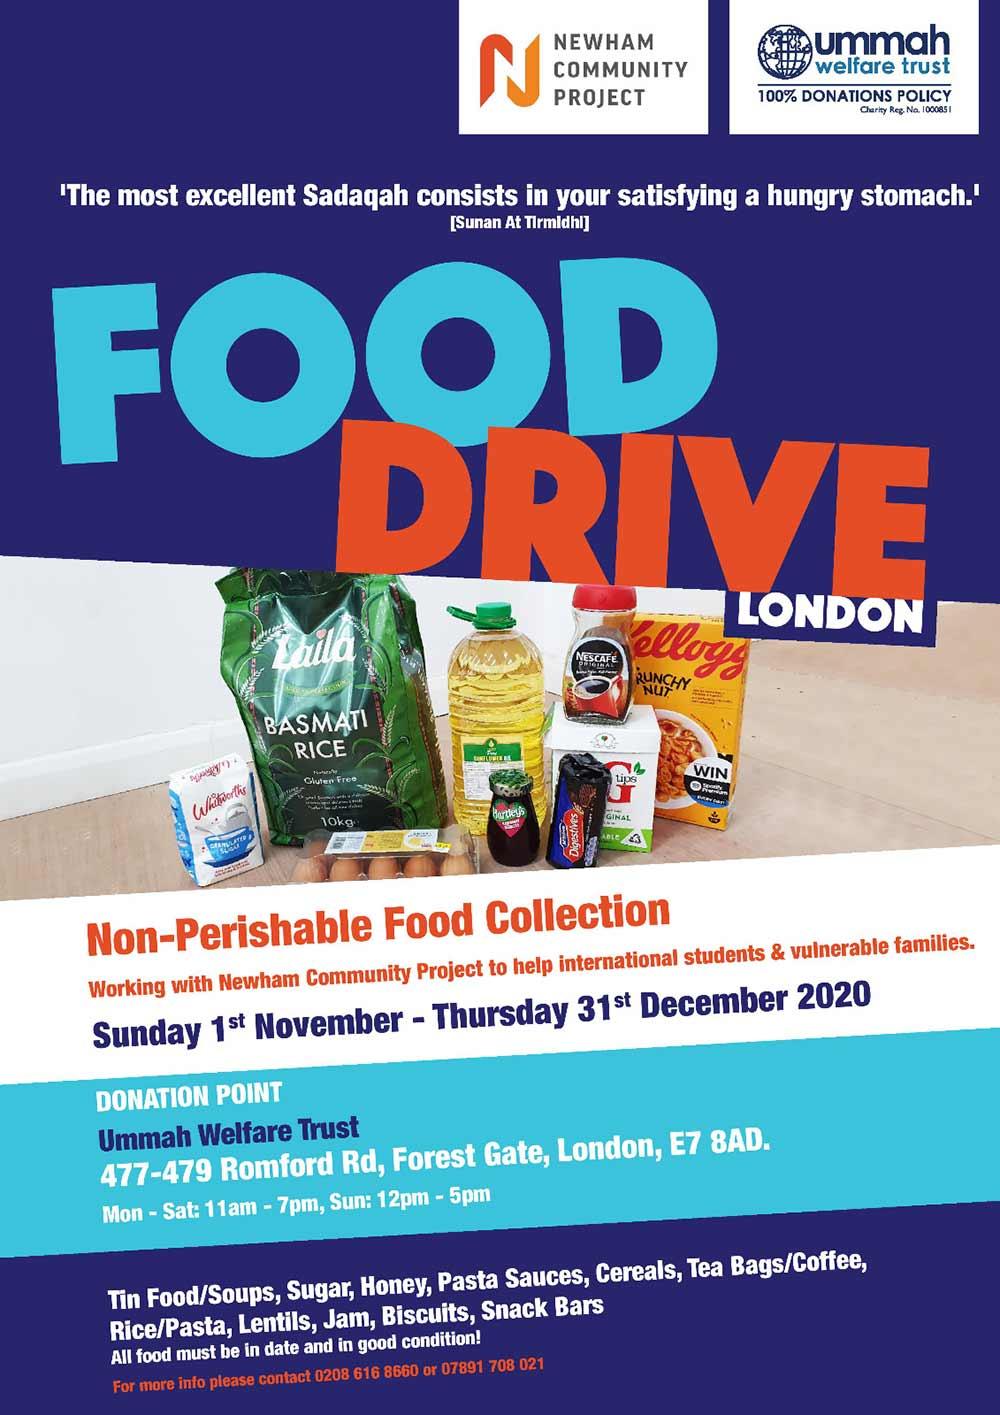 Homeless Food Drive London